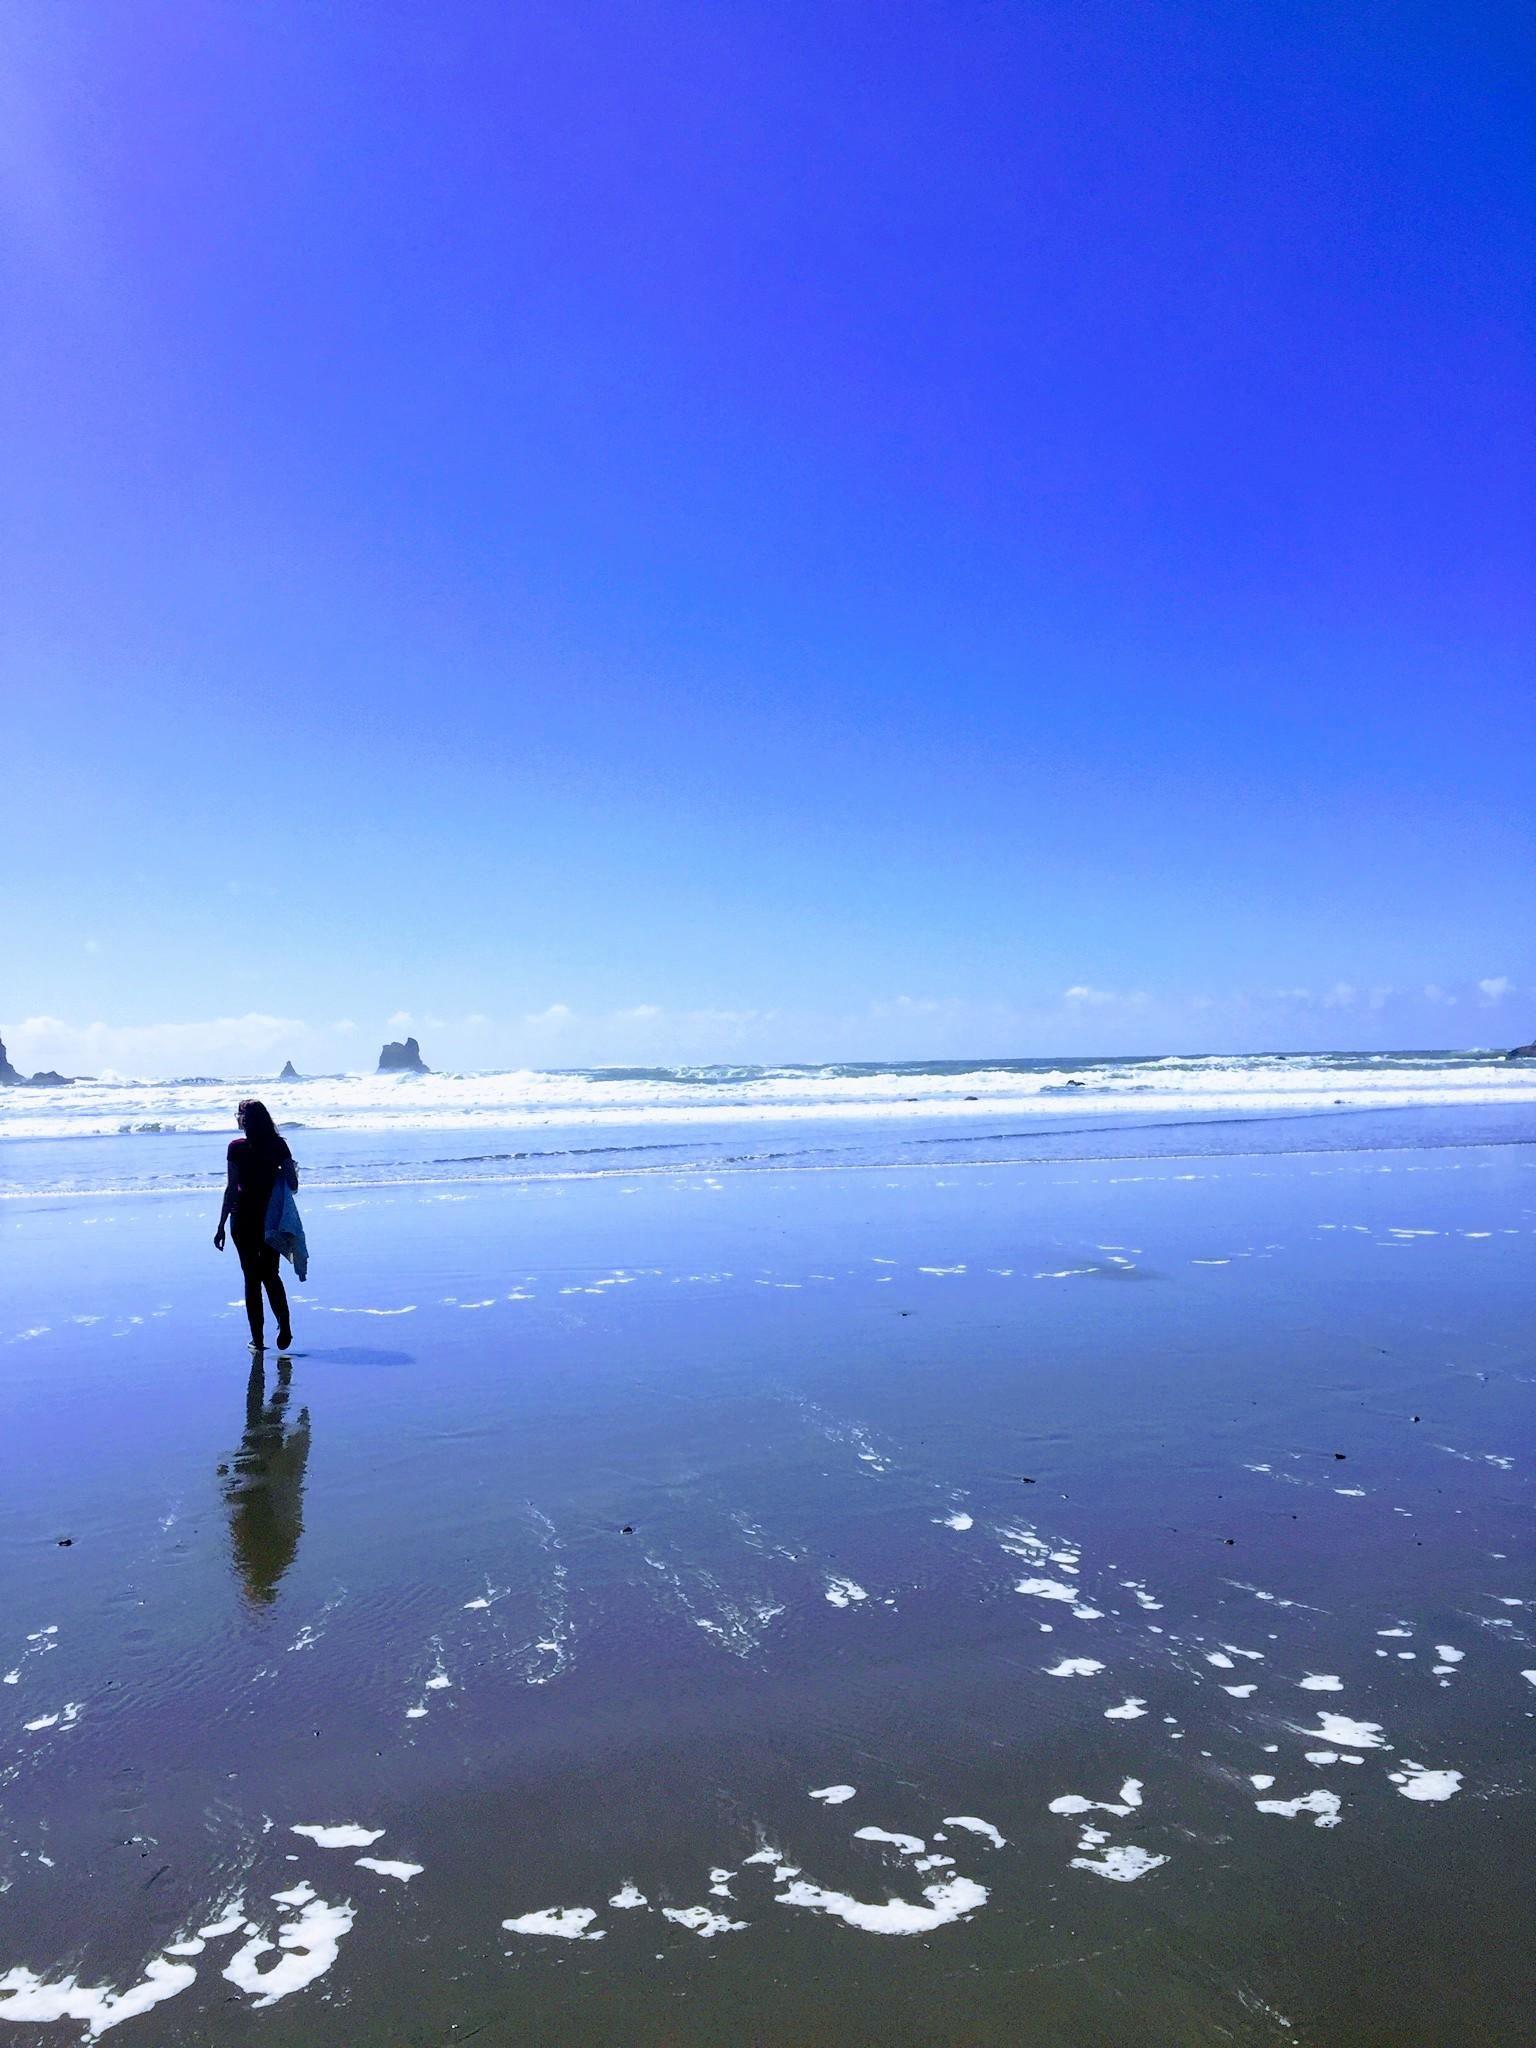 Exploring Second Beach WA [1536x2048] [OC]